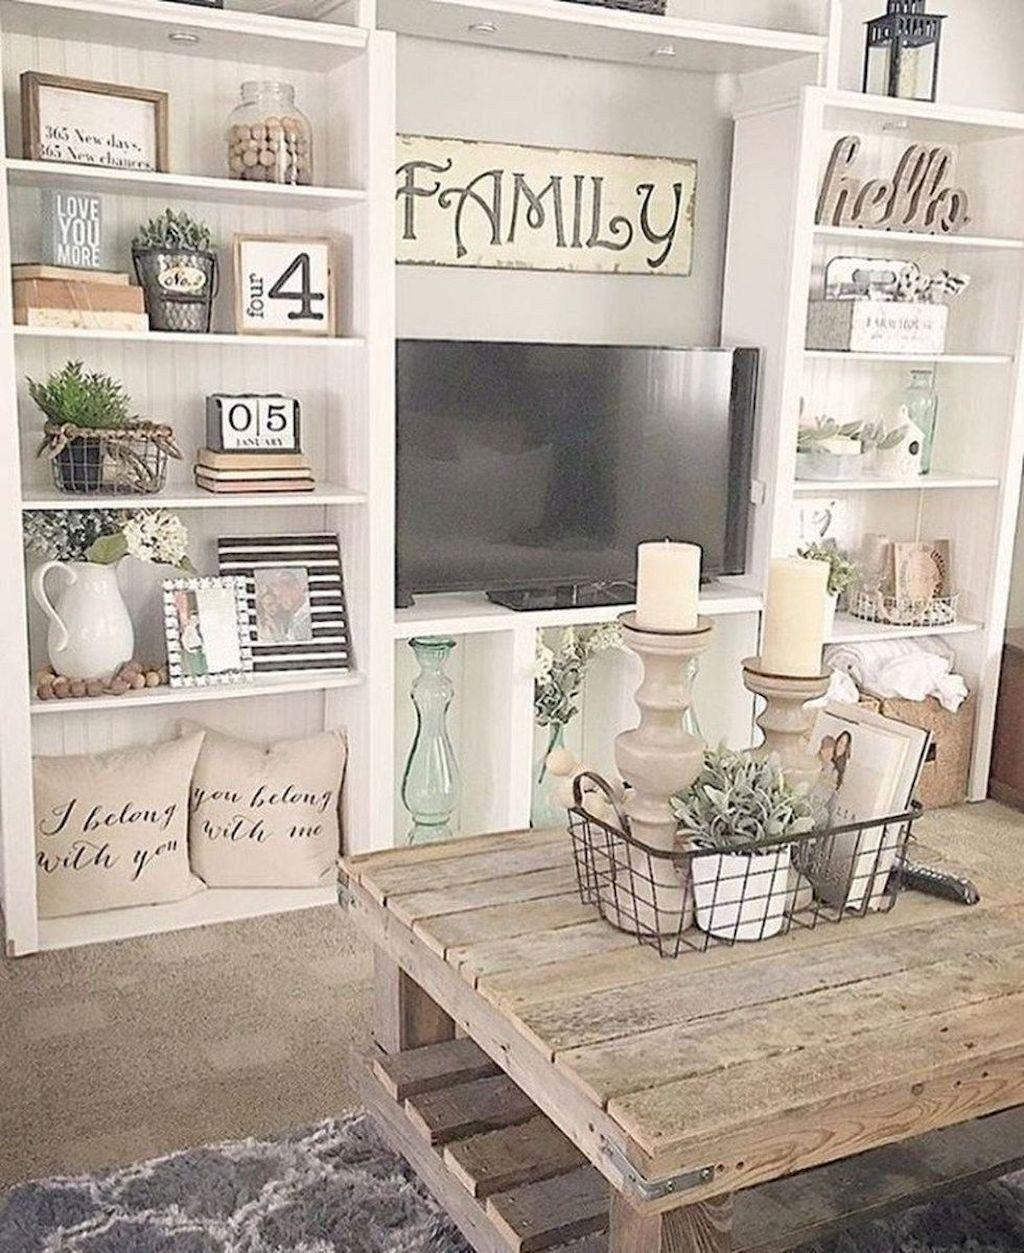 Best Farmhouse Living Room Makeover Decor Ideas 35 | living room ...